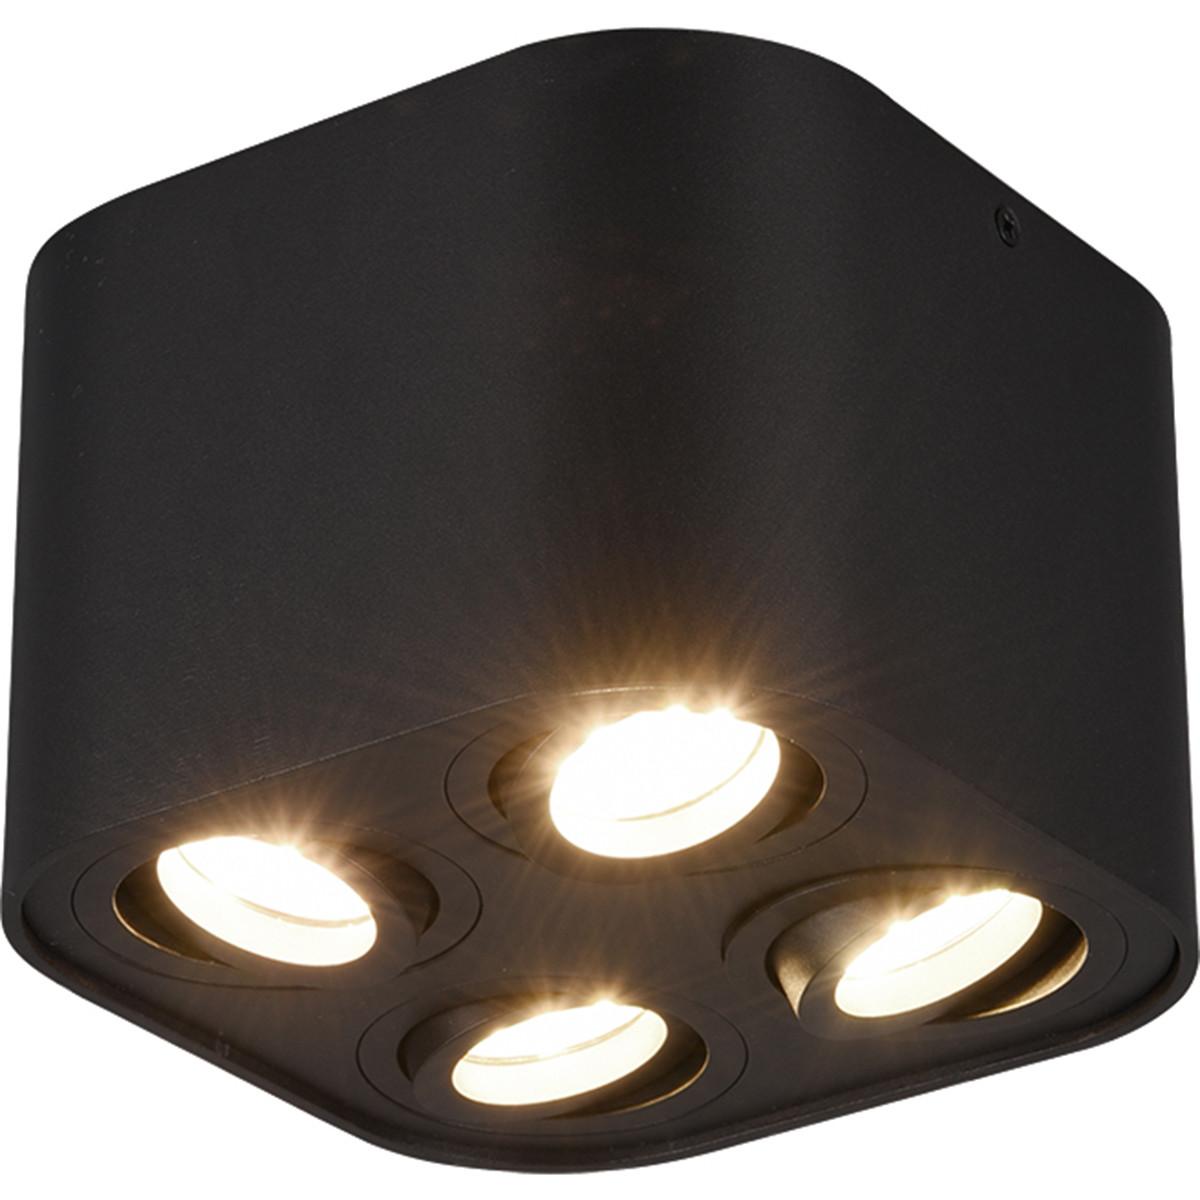 LED Plafondlamp - Plafondverlichting - Trion Cosmin - GU10 Fitting - 4-lichts - Vierkant - Mat Zwart